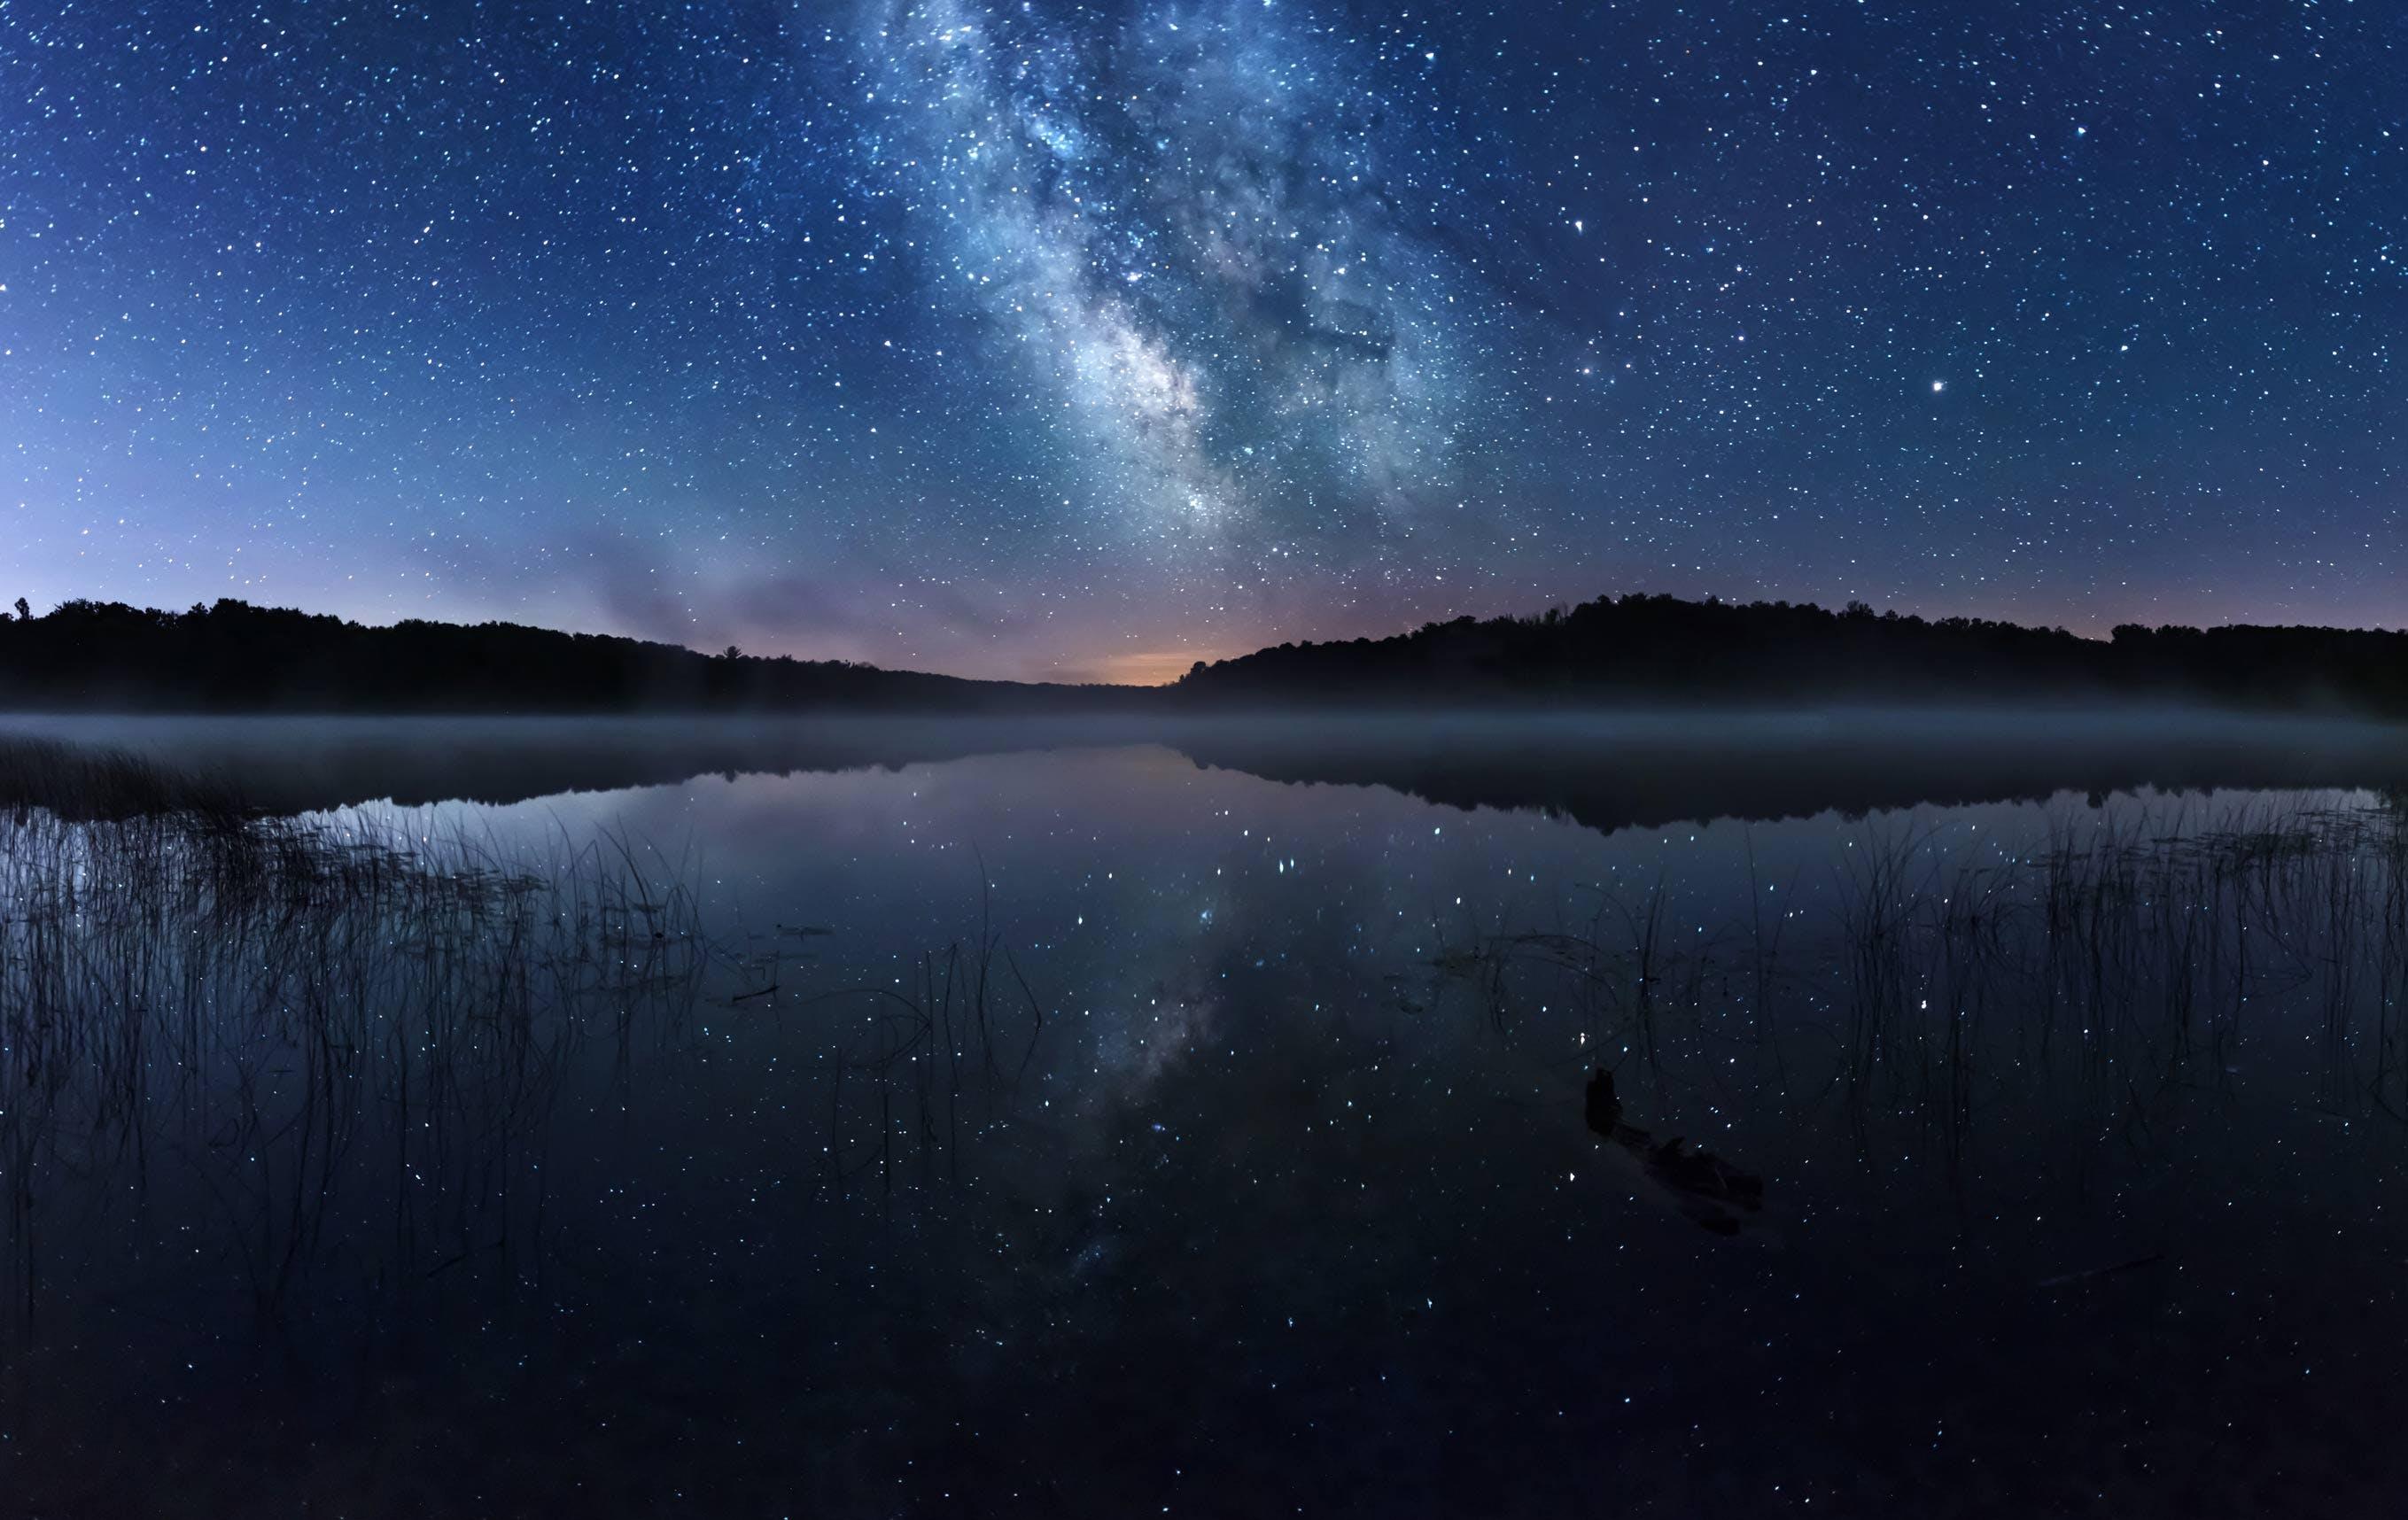 Cedar Lake Dock view of Milky Way